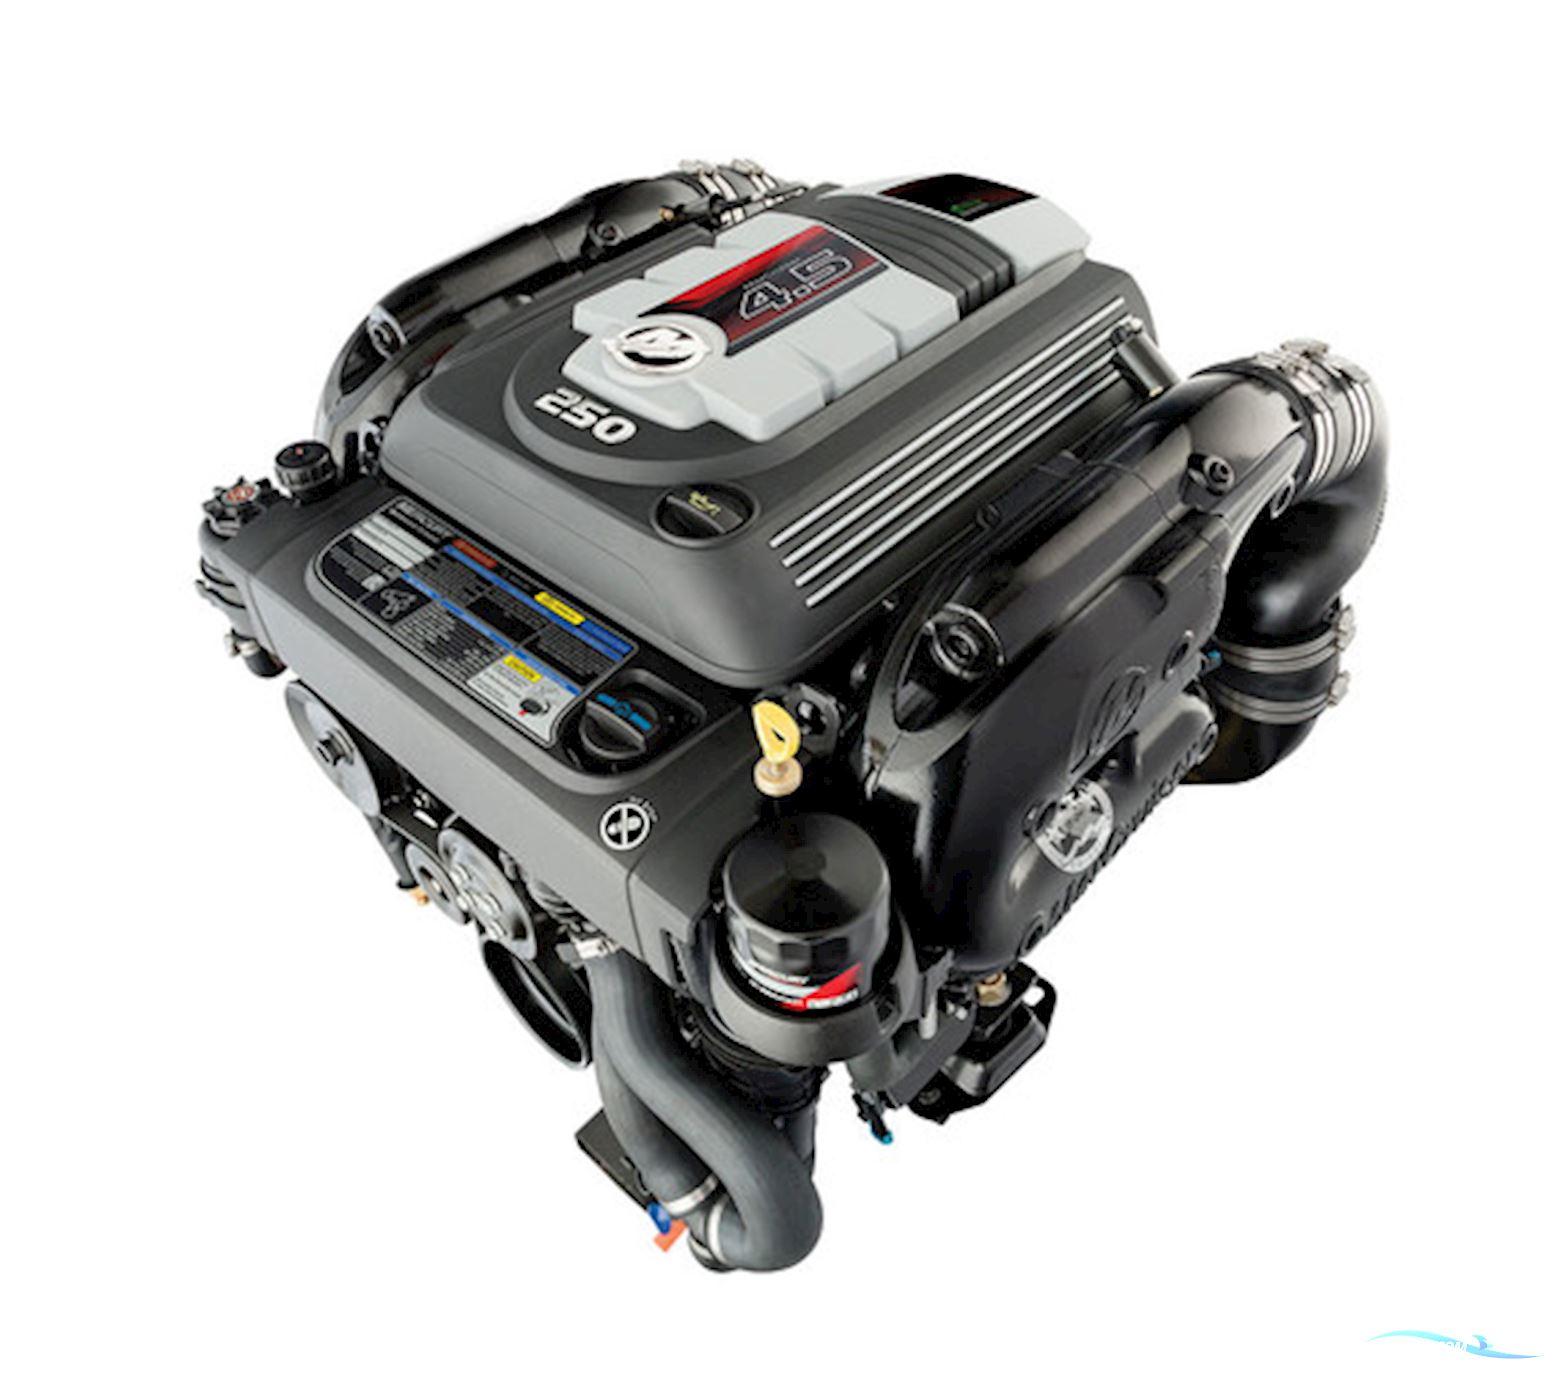 MerCruiser 4.5L MPI 250hk Bravo II drivline